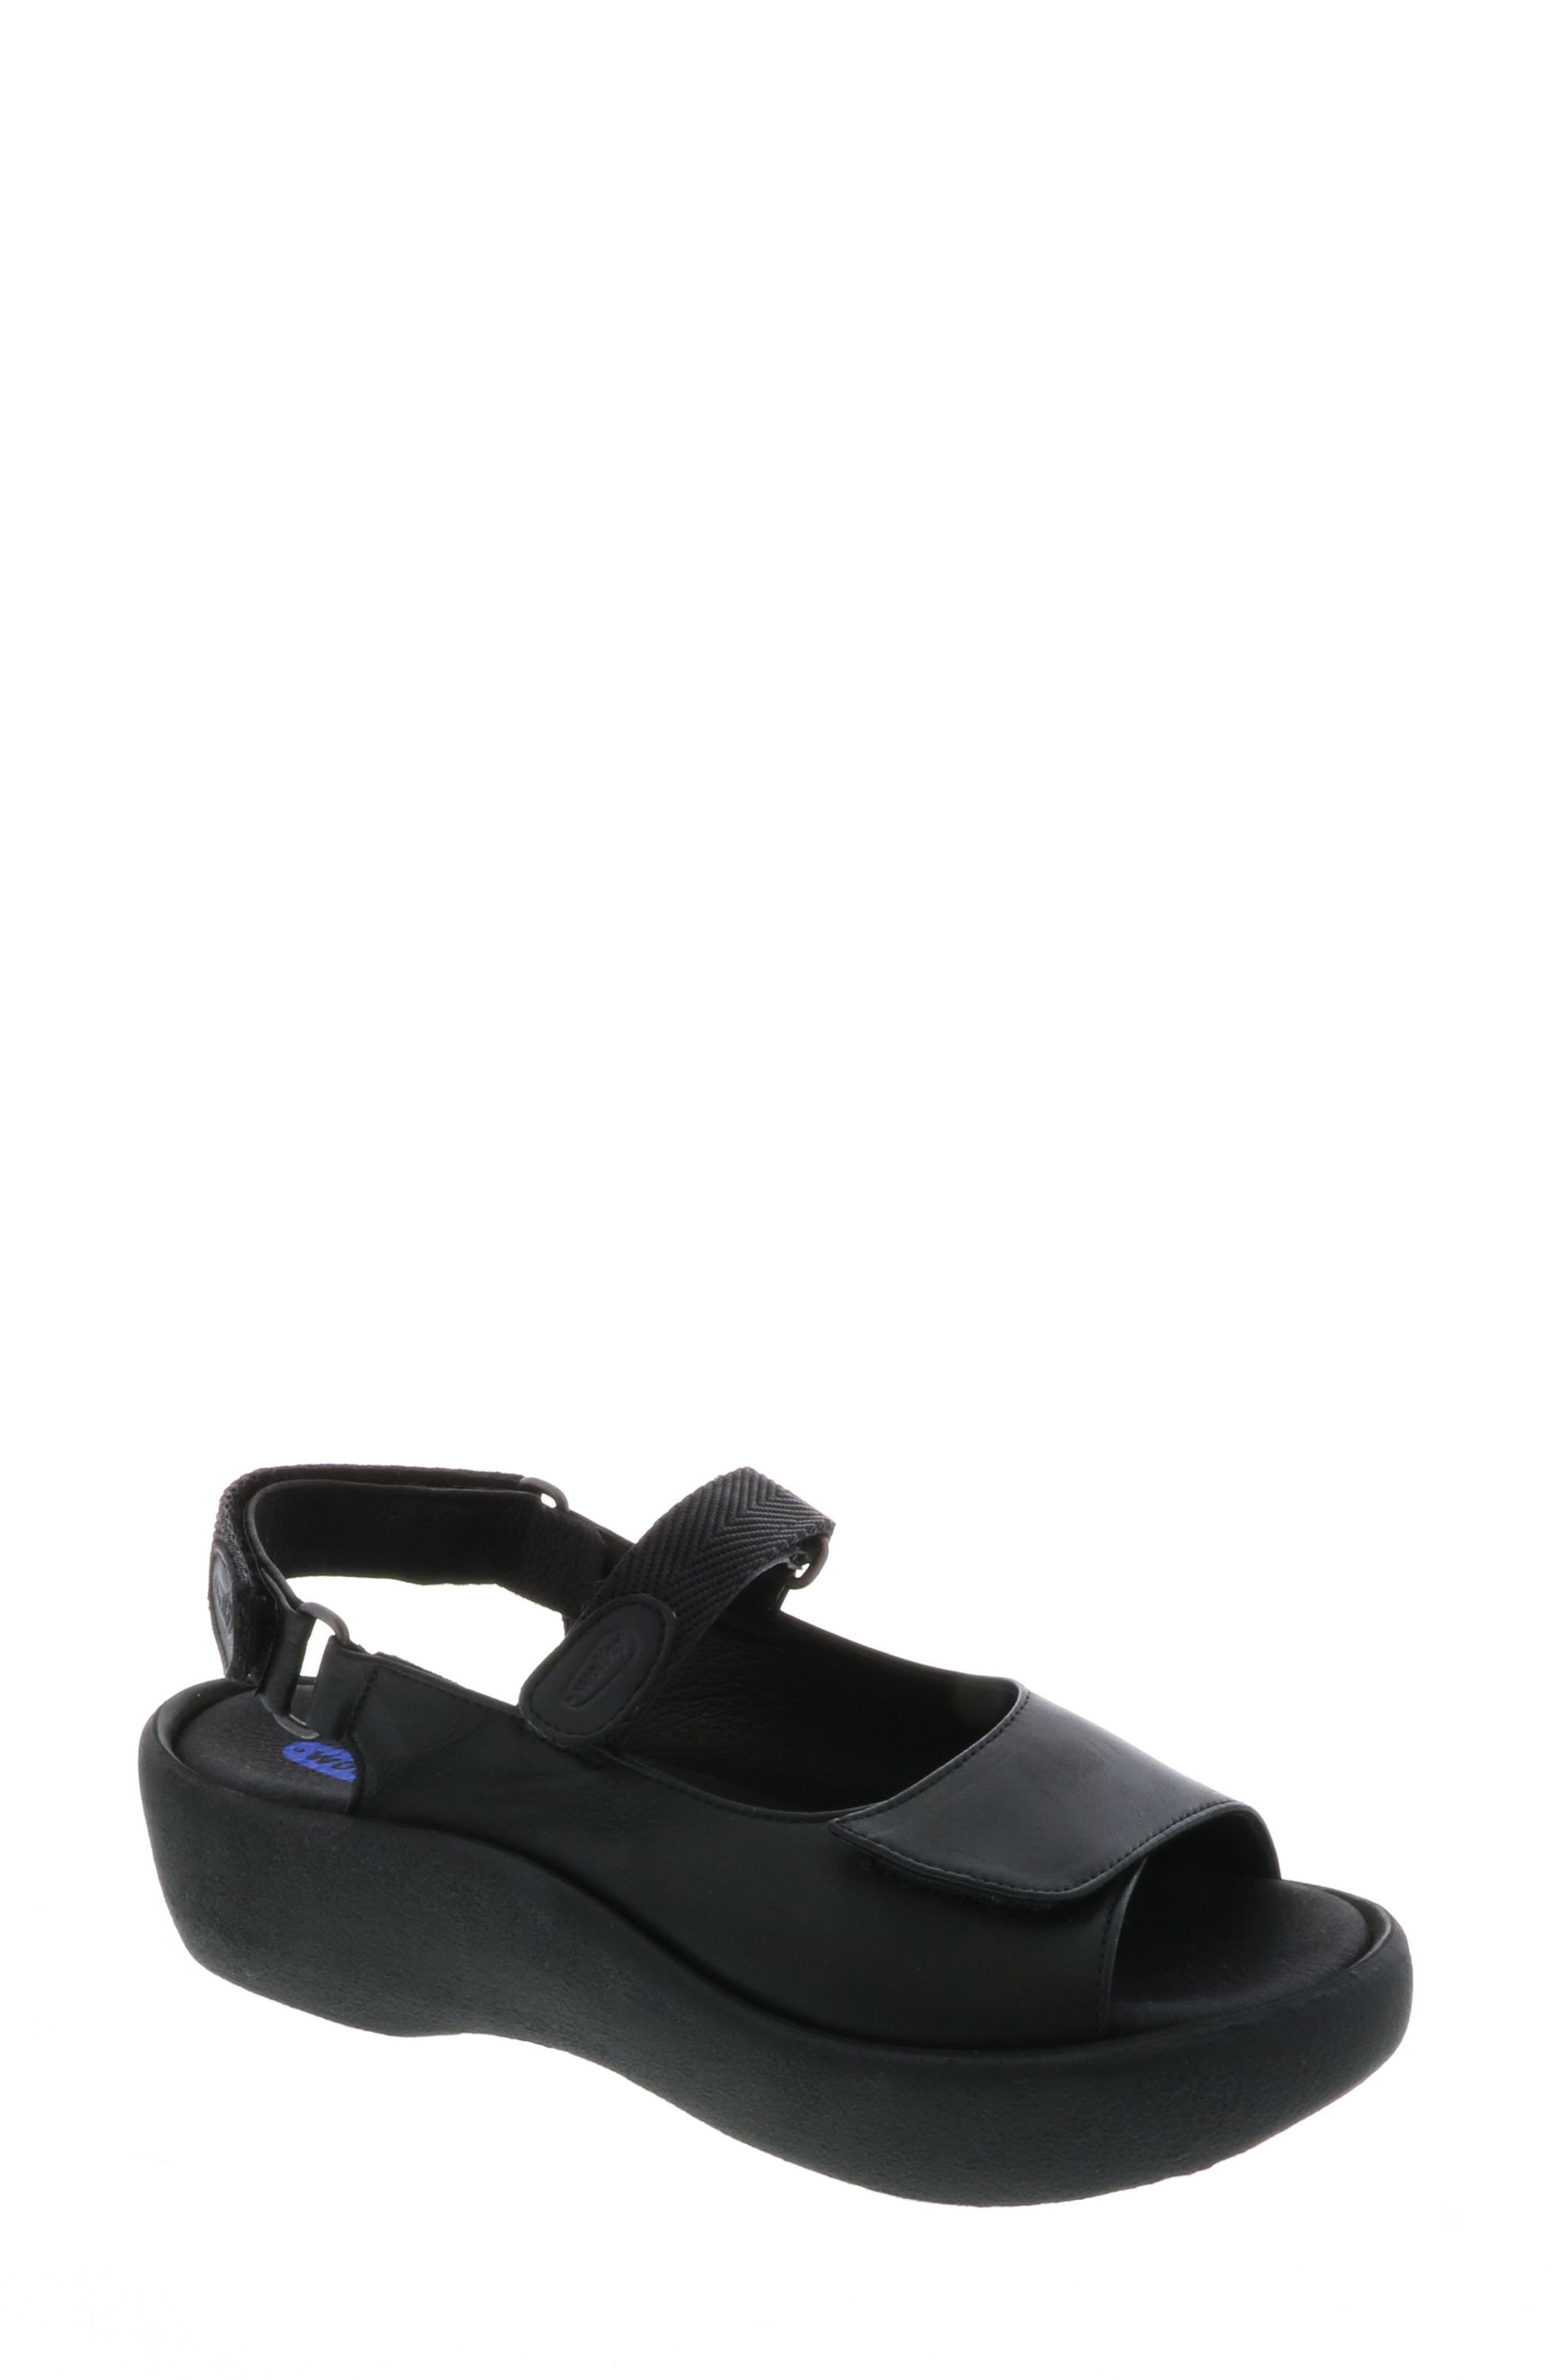 Jewel Sport Sandal,                         Main,                         color, BLACK/ BLACK